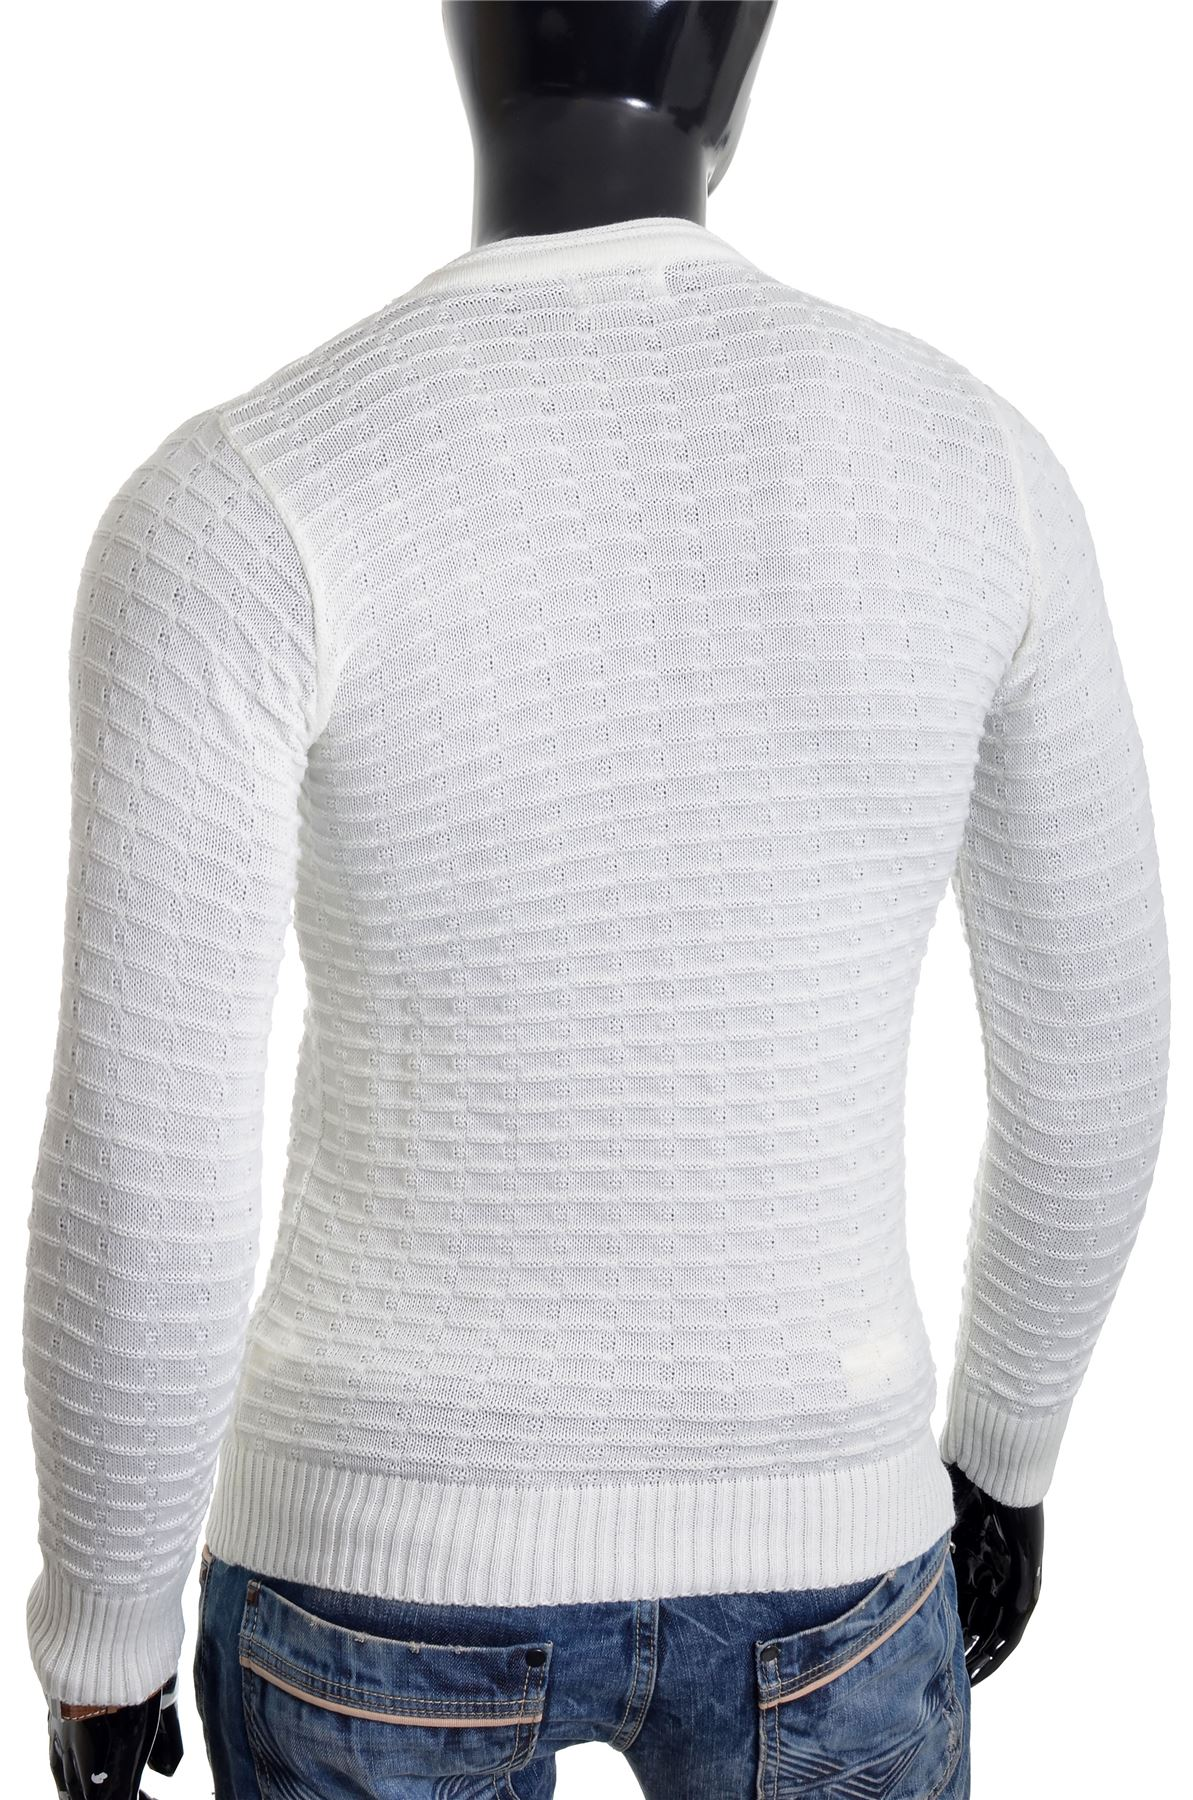 Men-039-s-Jumper-Striped-Knit-Smart-Long-Sleeve-Sweater-Crew-Neck-Top-Slim-Fitness thumbnail 16